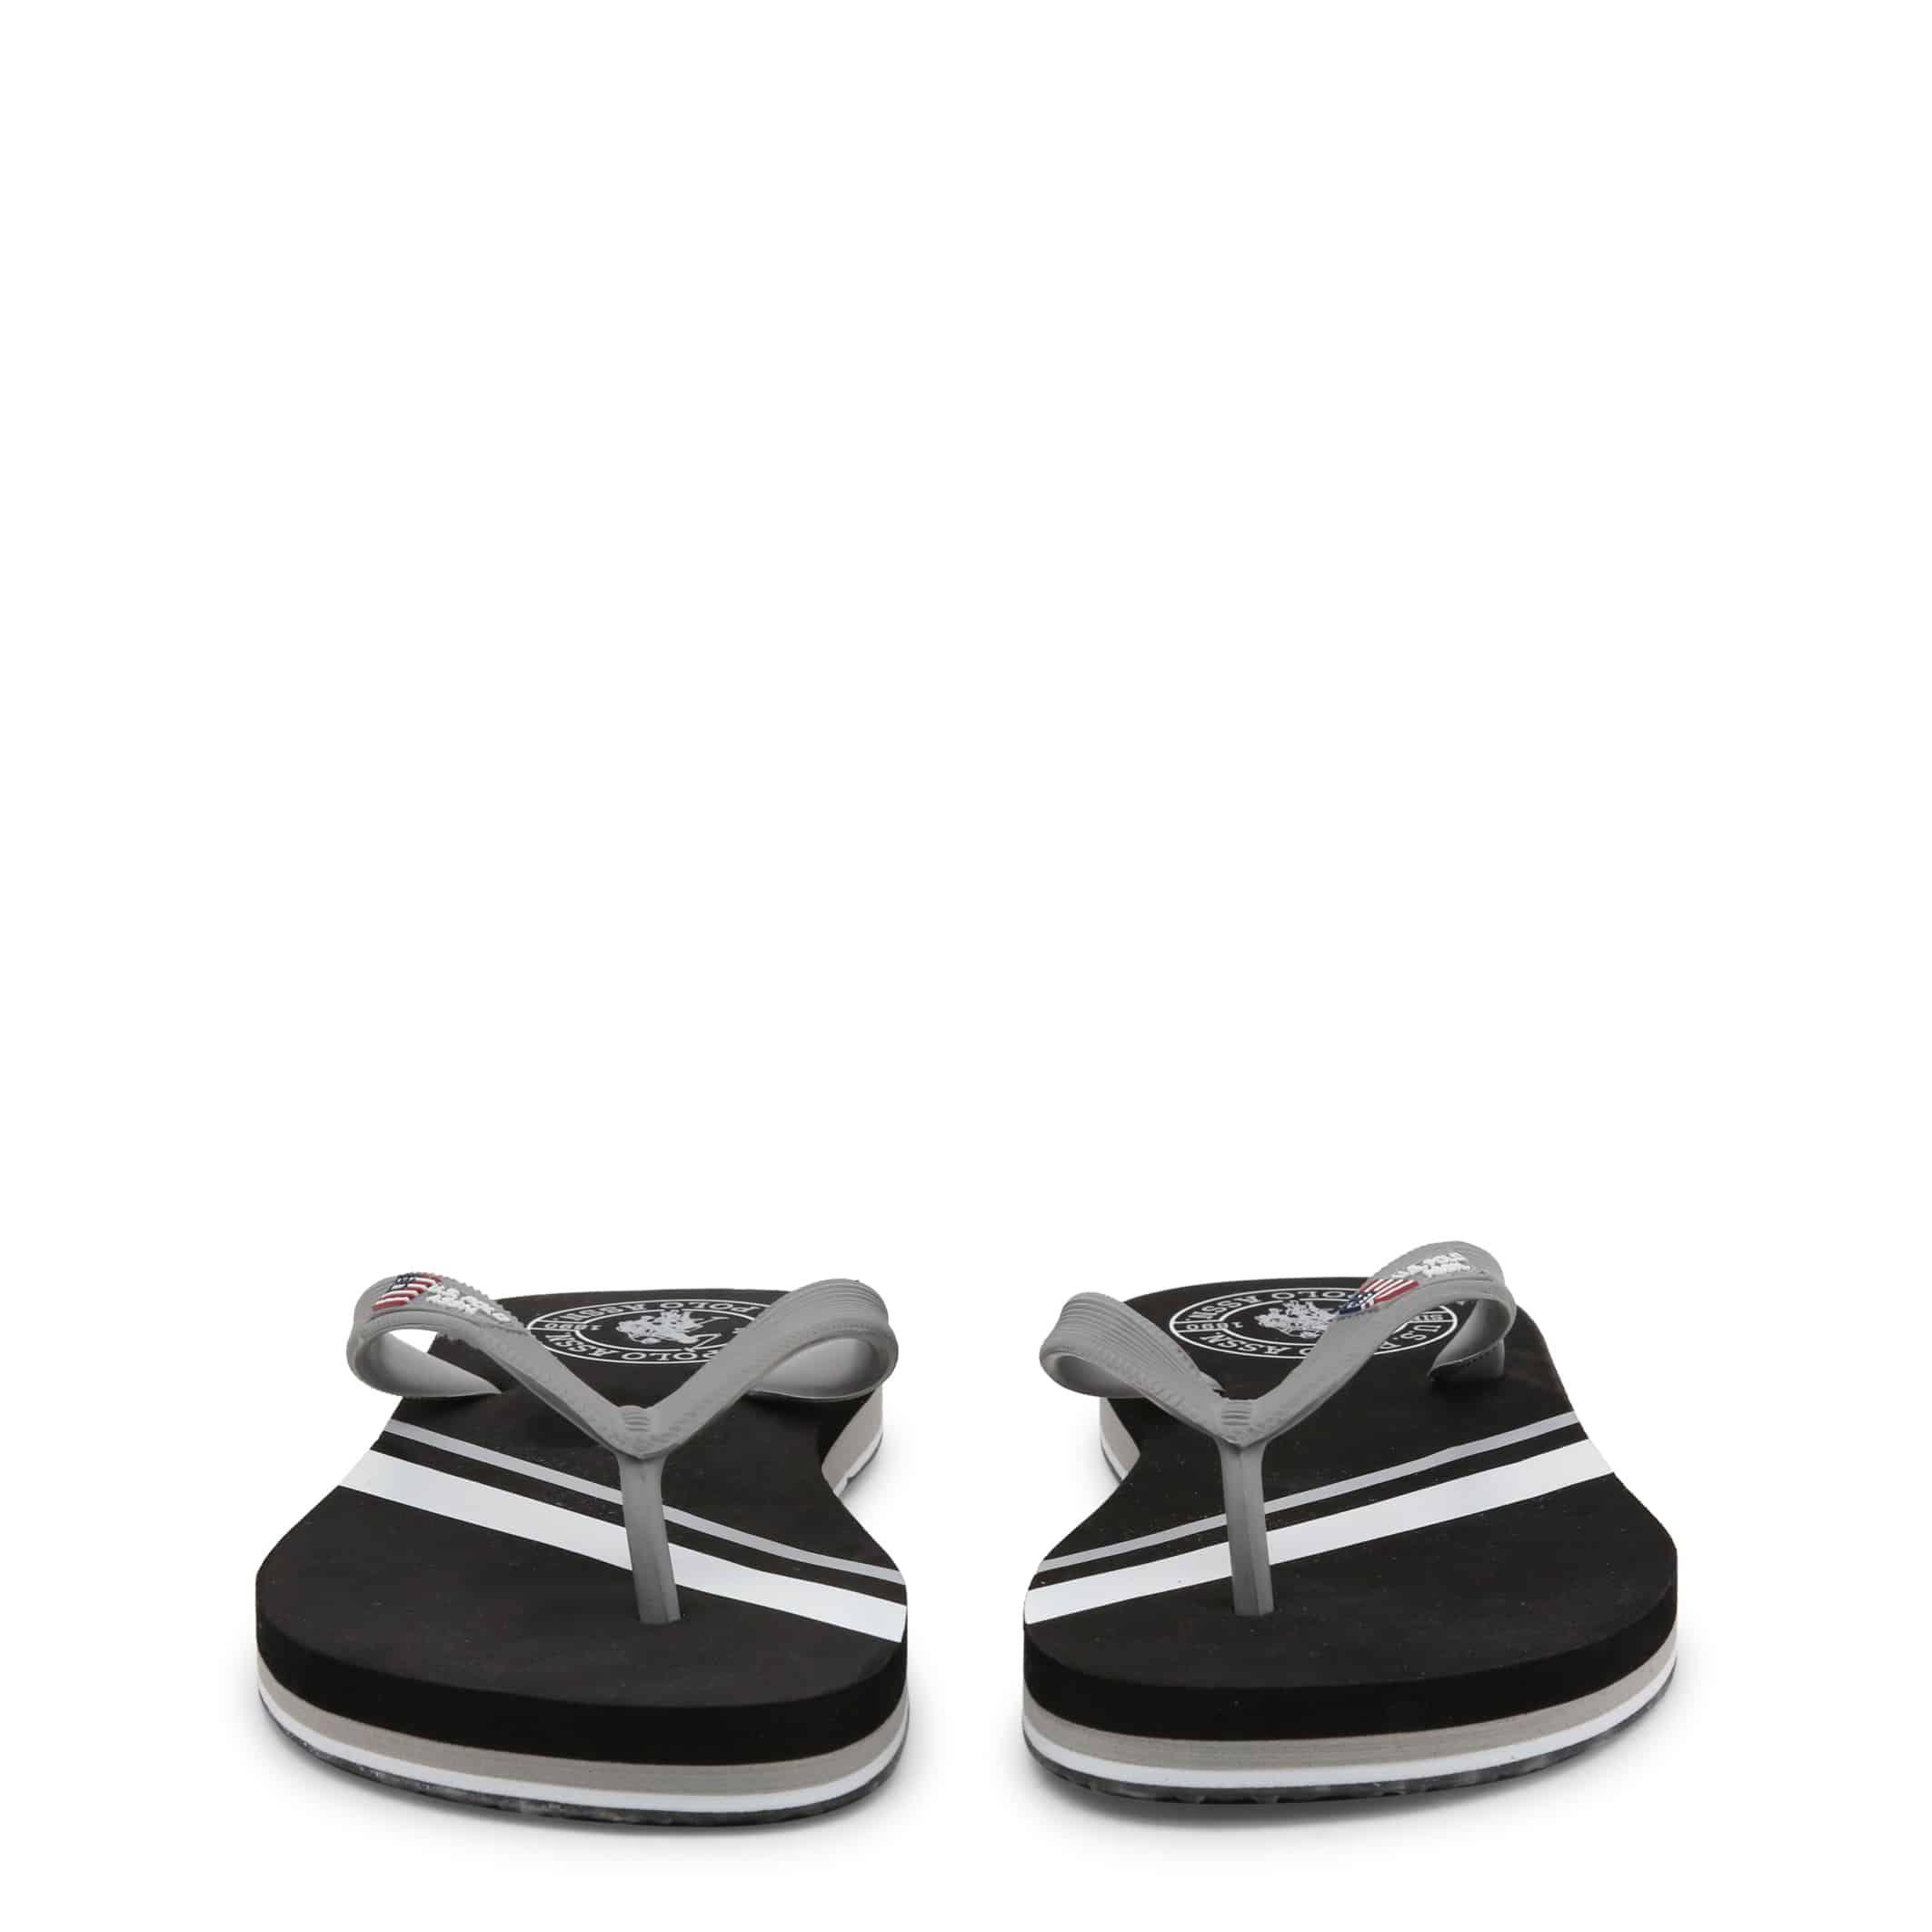 Nu-pieds et Tongs U.S. Polo Assn. – MELL4197S8_G1